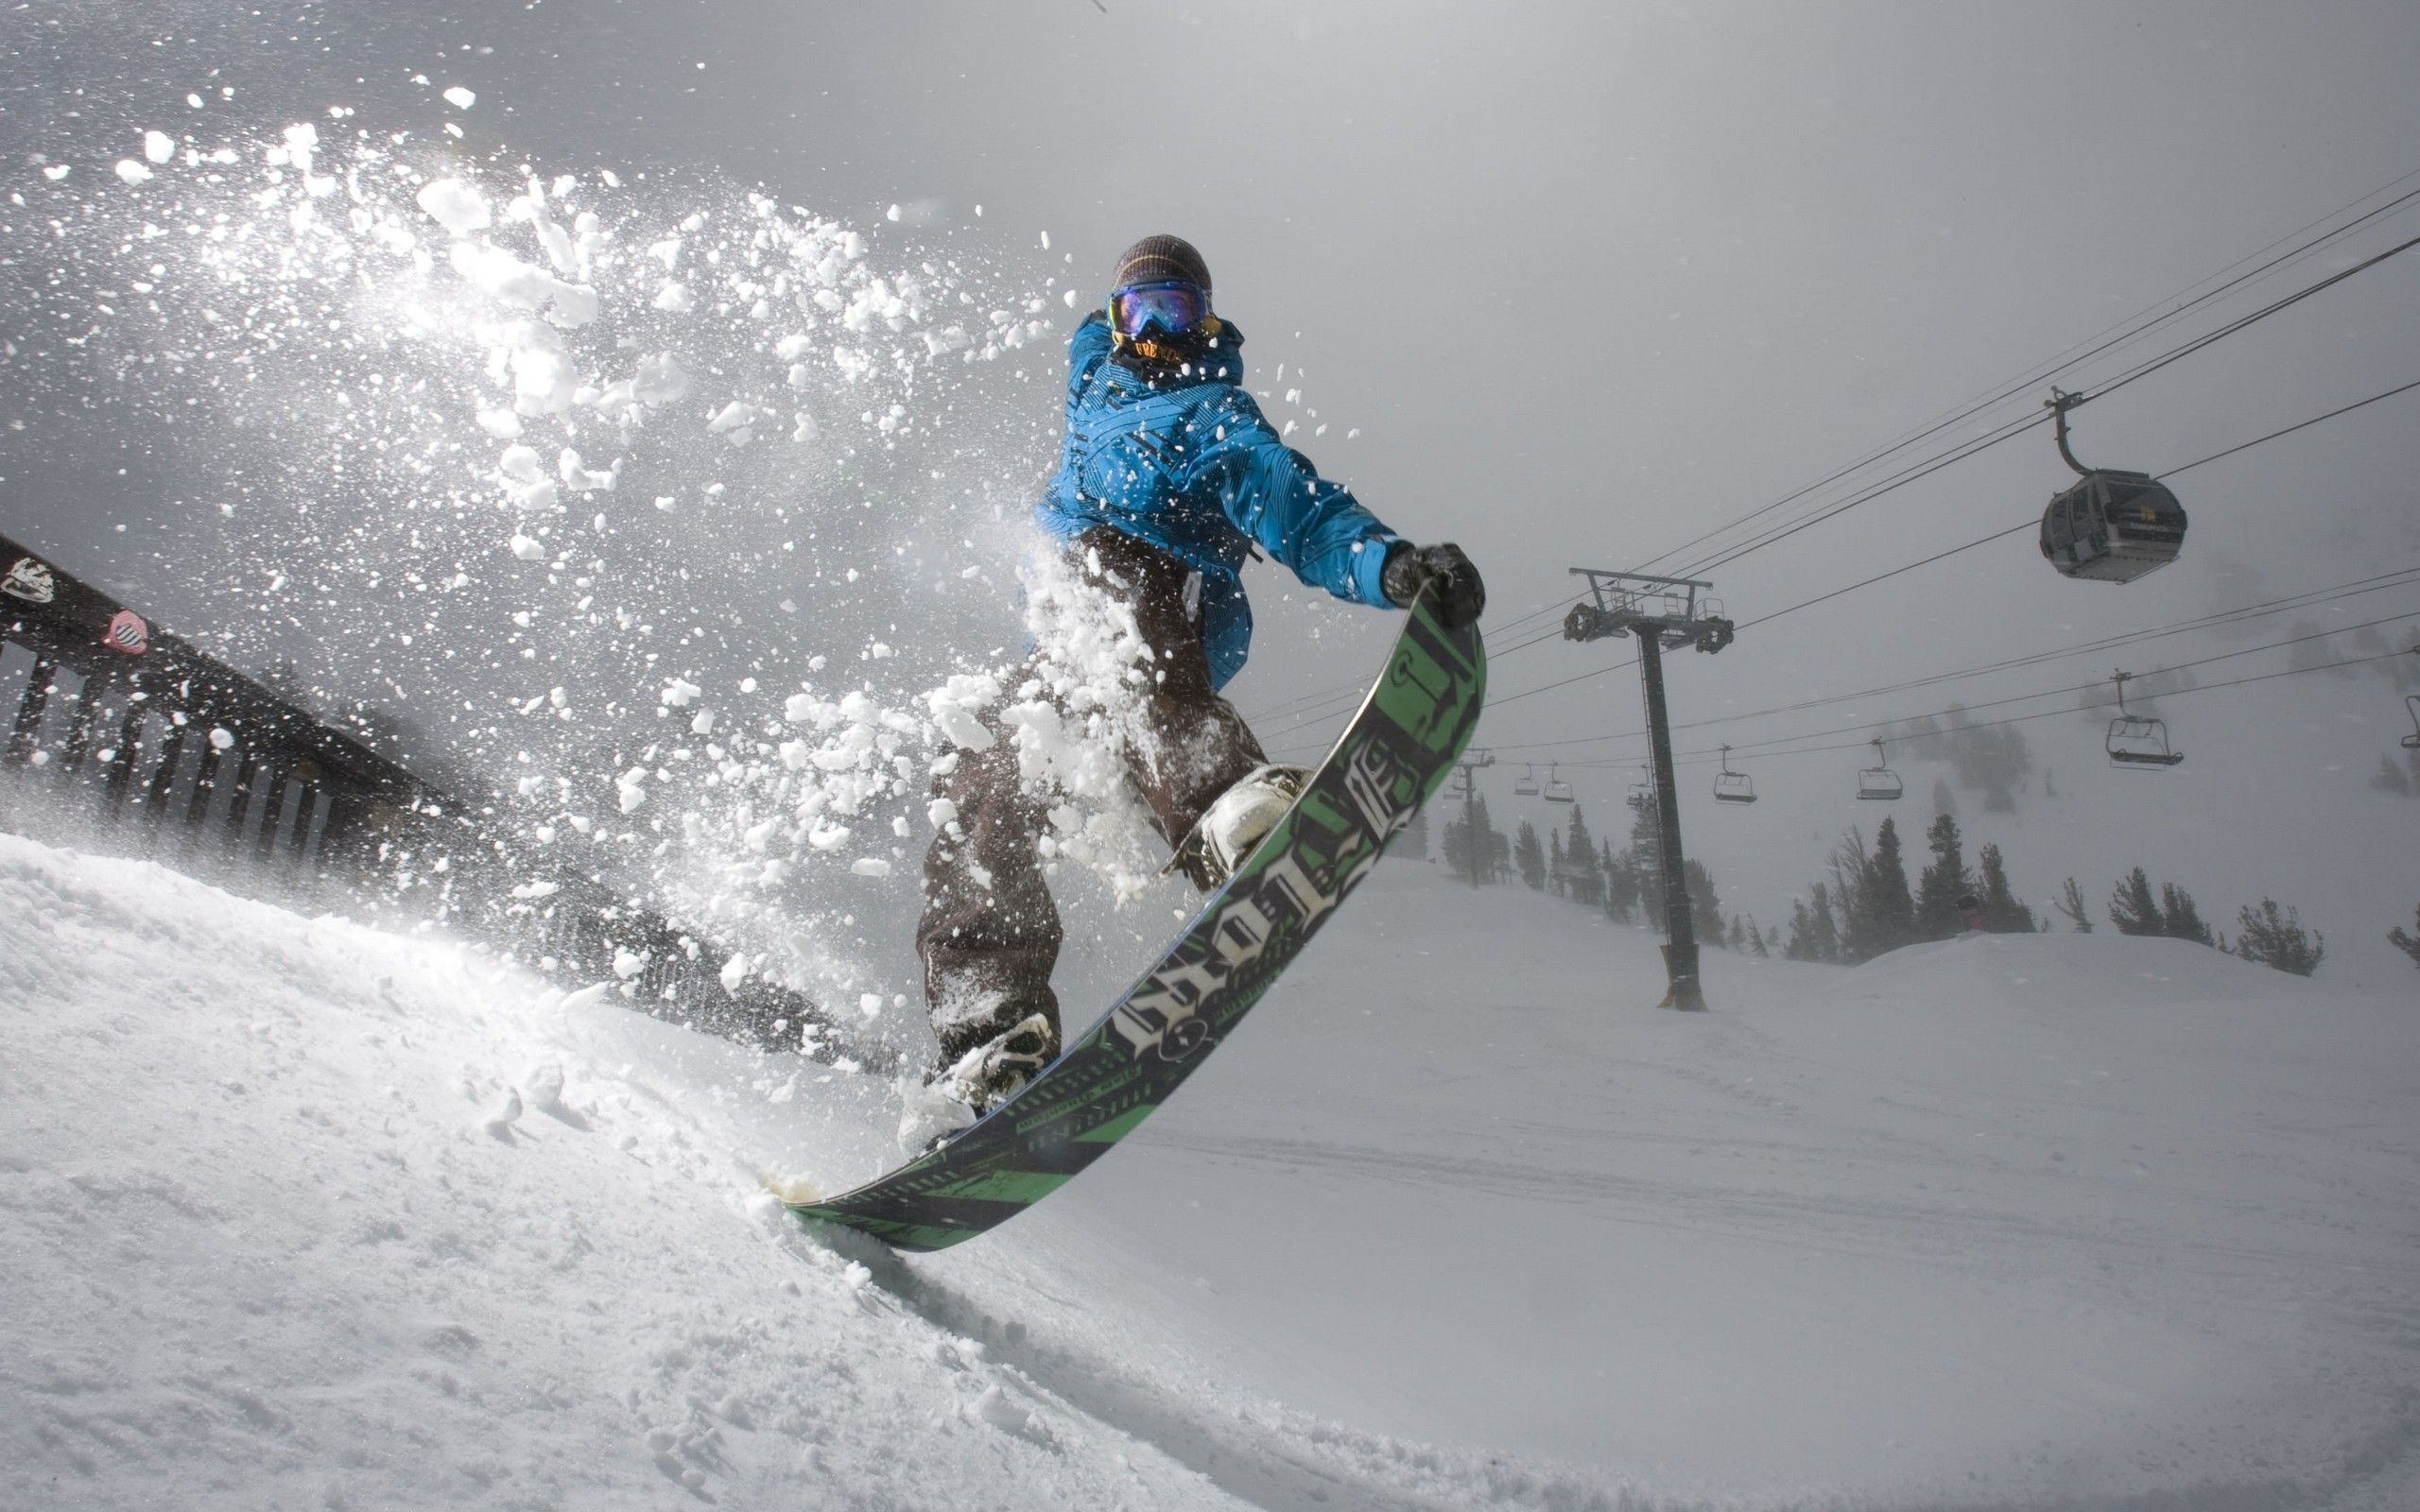 amazing snowboarding picture